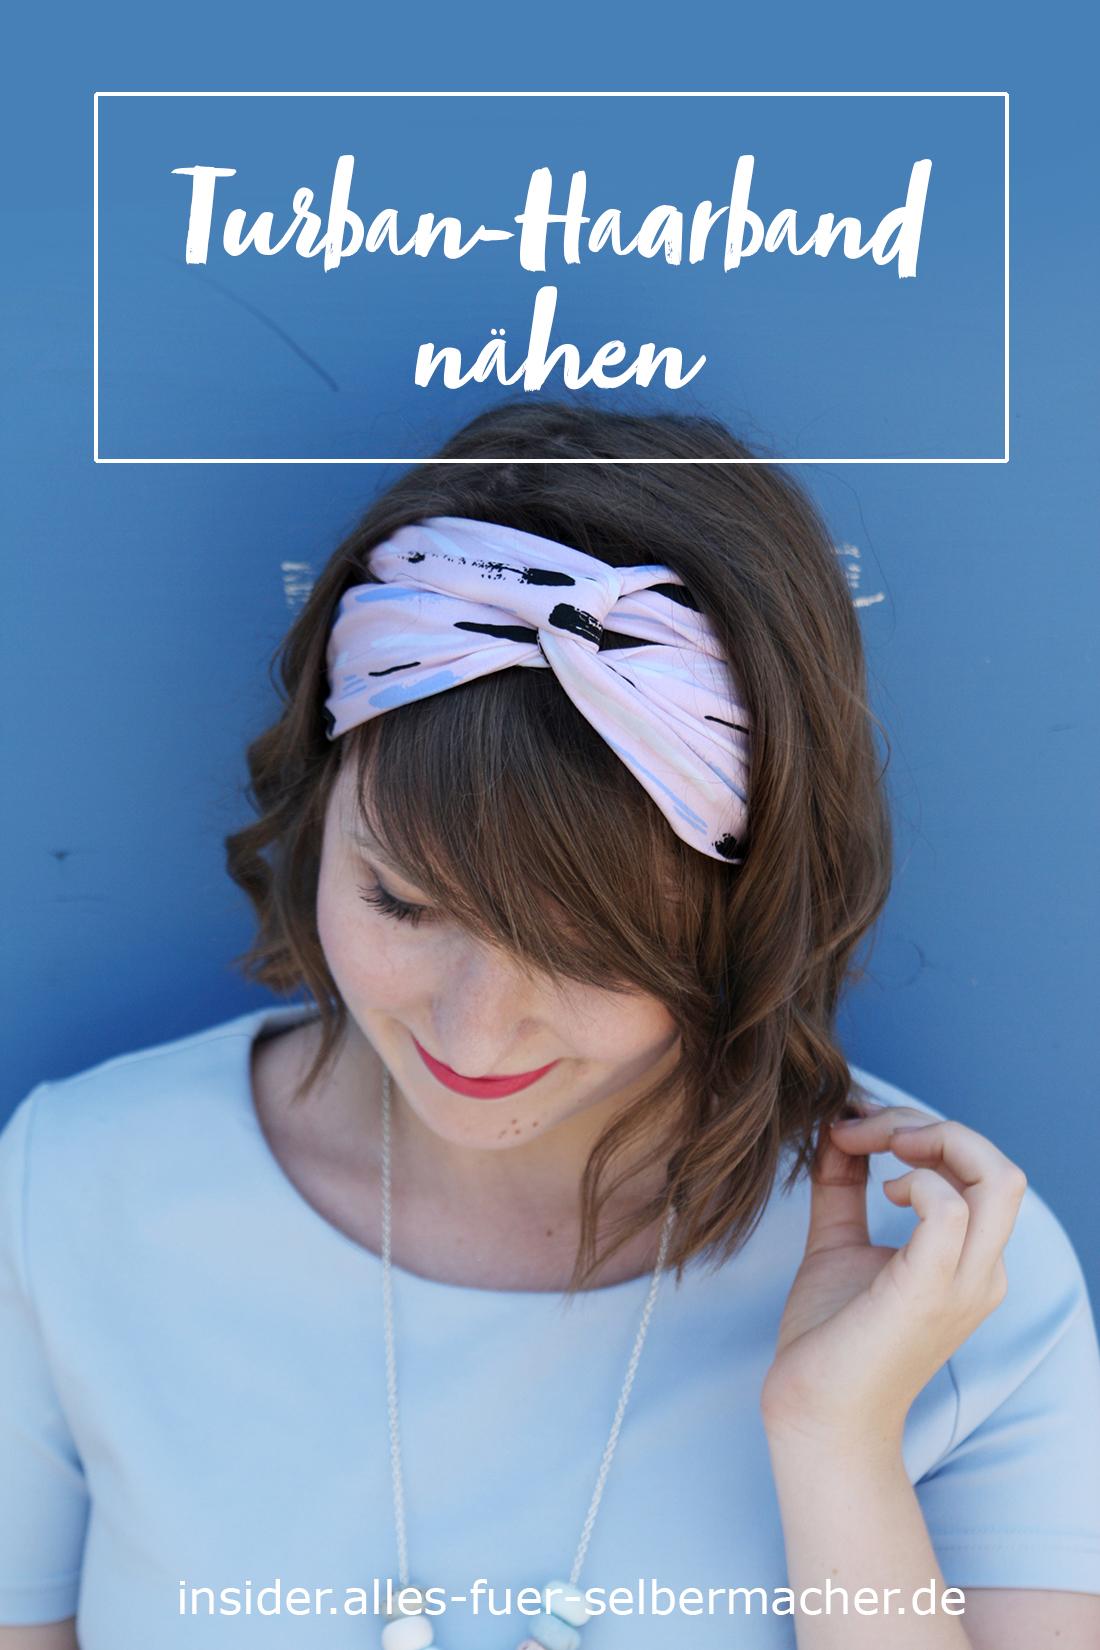 Turban Haarband nähen | Blog • alles-fuer-selbermacher